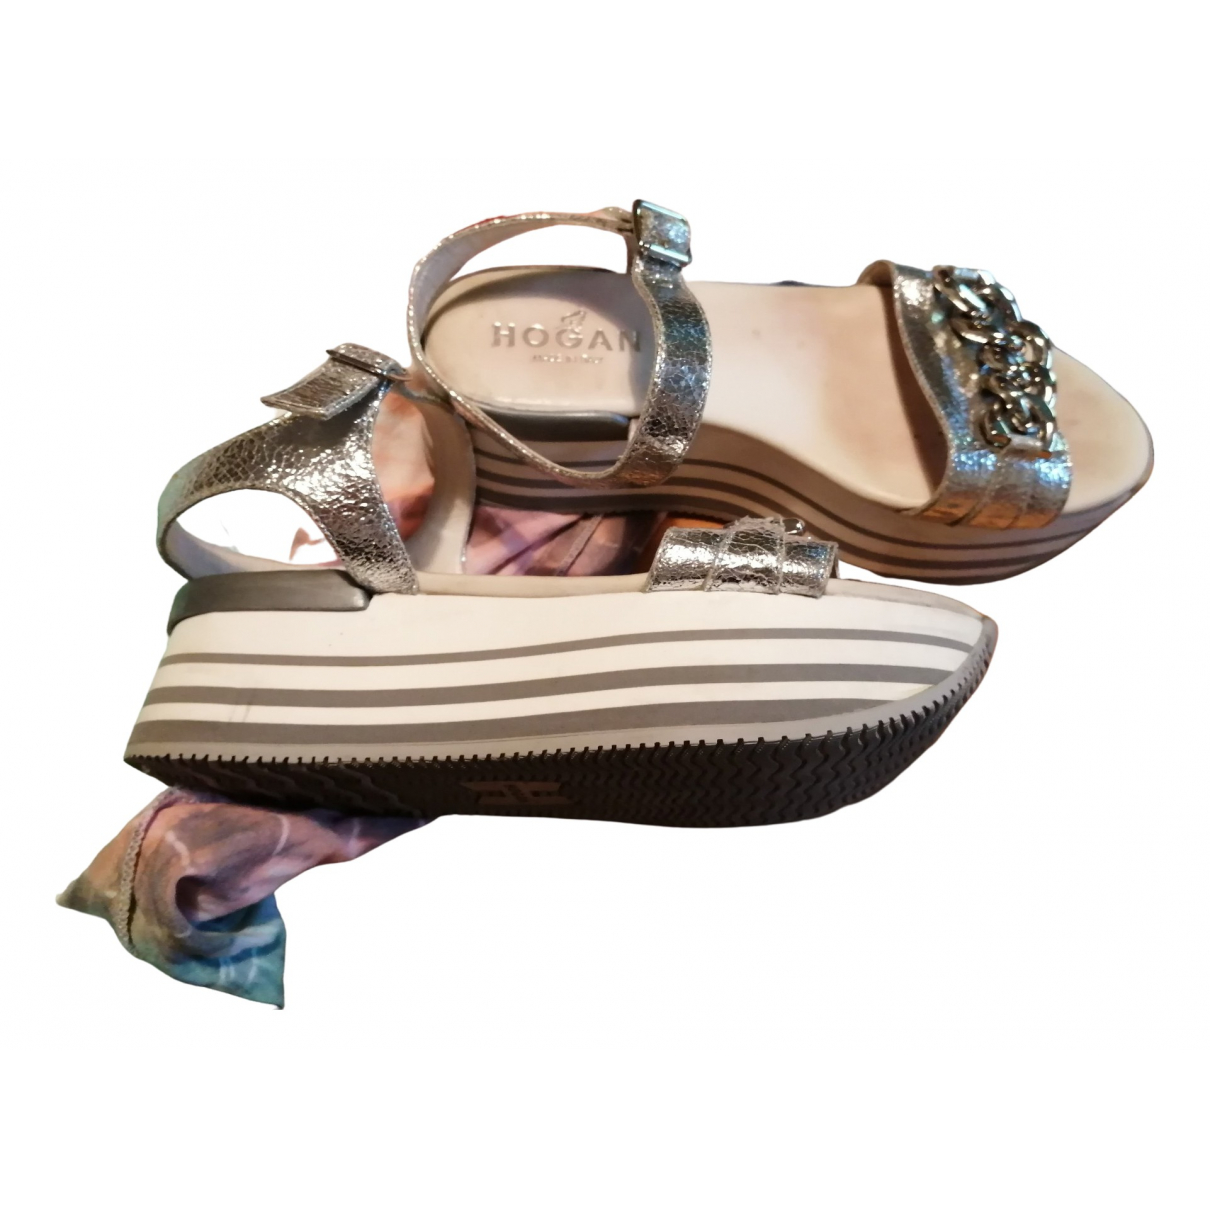 Hogan \N Silver Leather Sandals for Women 37.5 EU